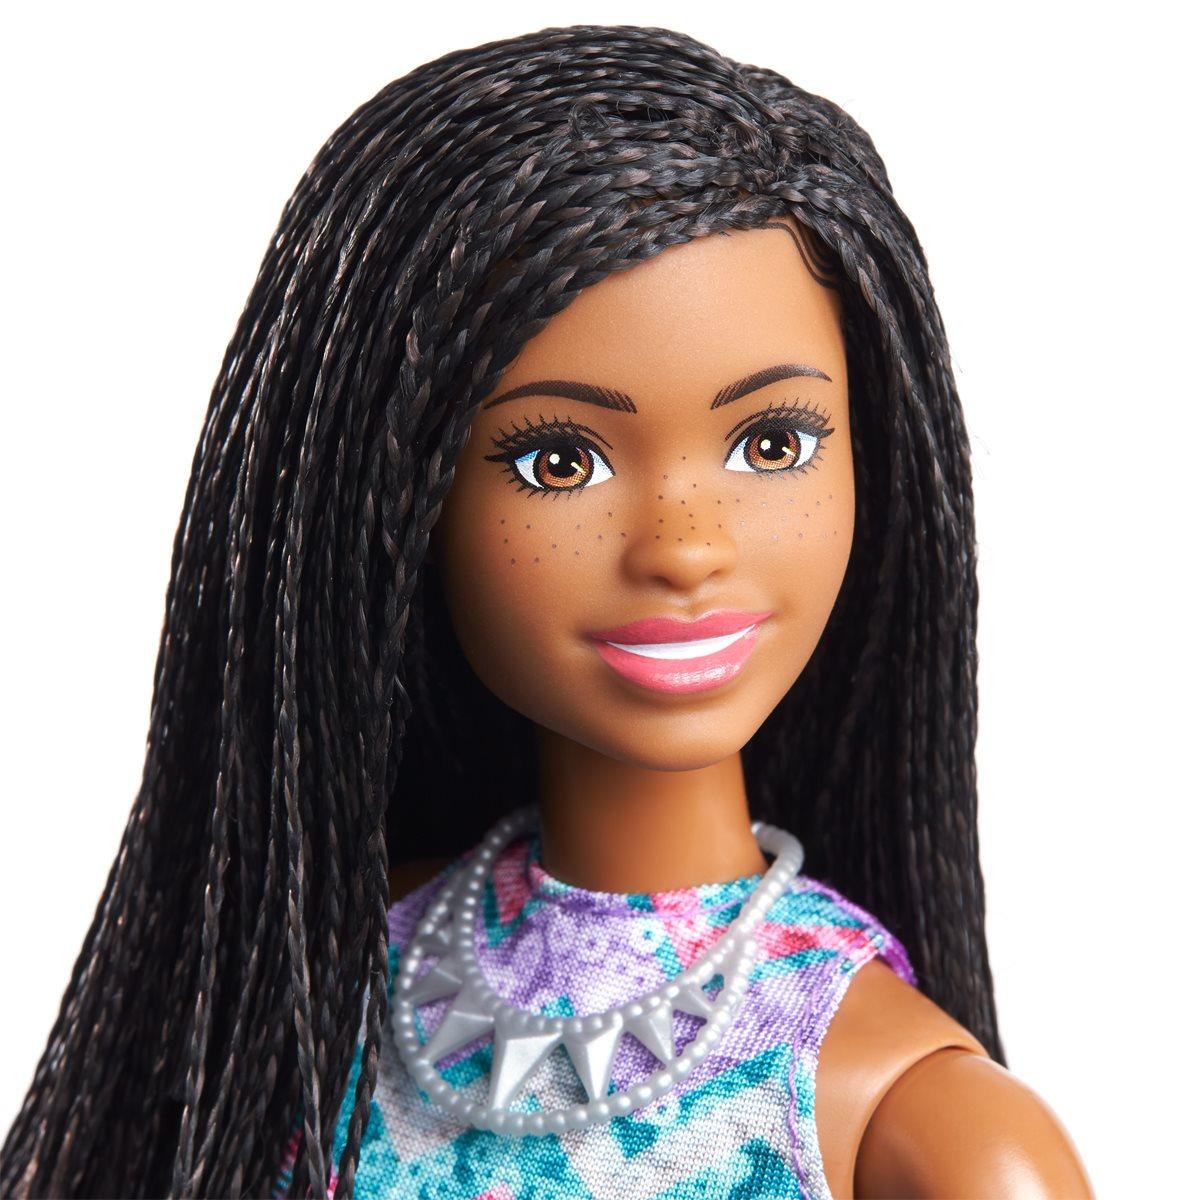 Barbie Big City Big Dreams Brooklyn Doll face